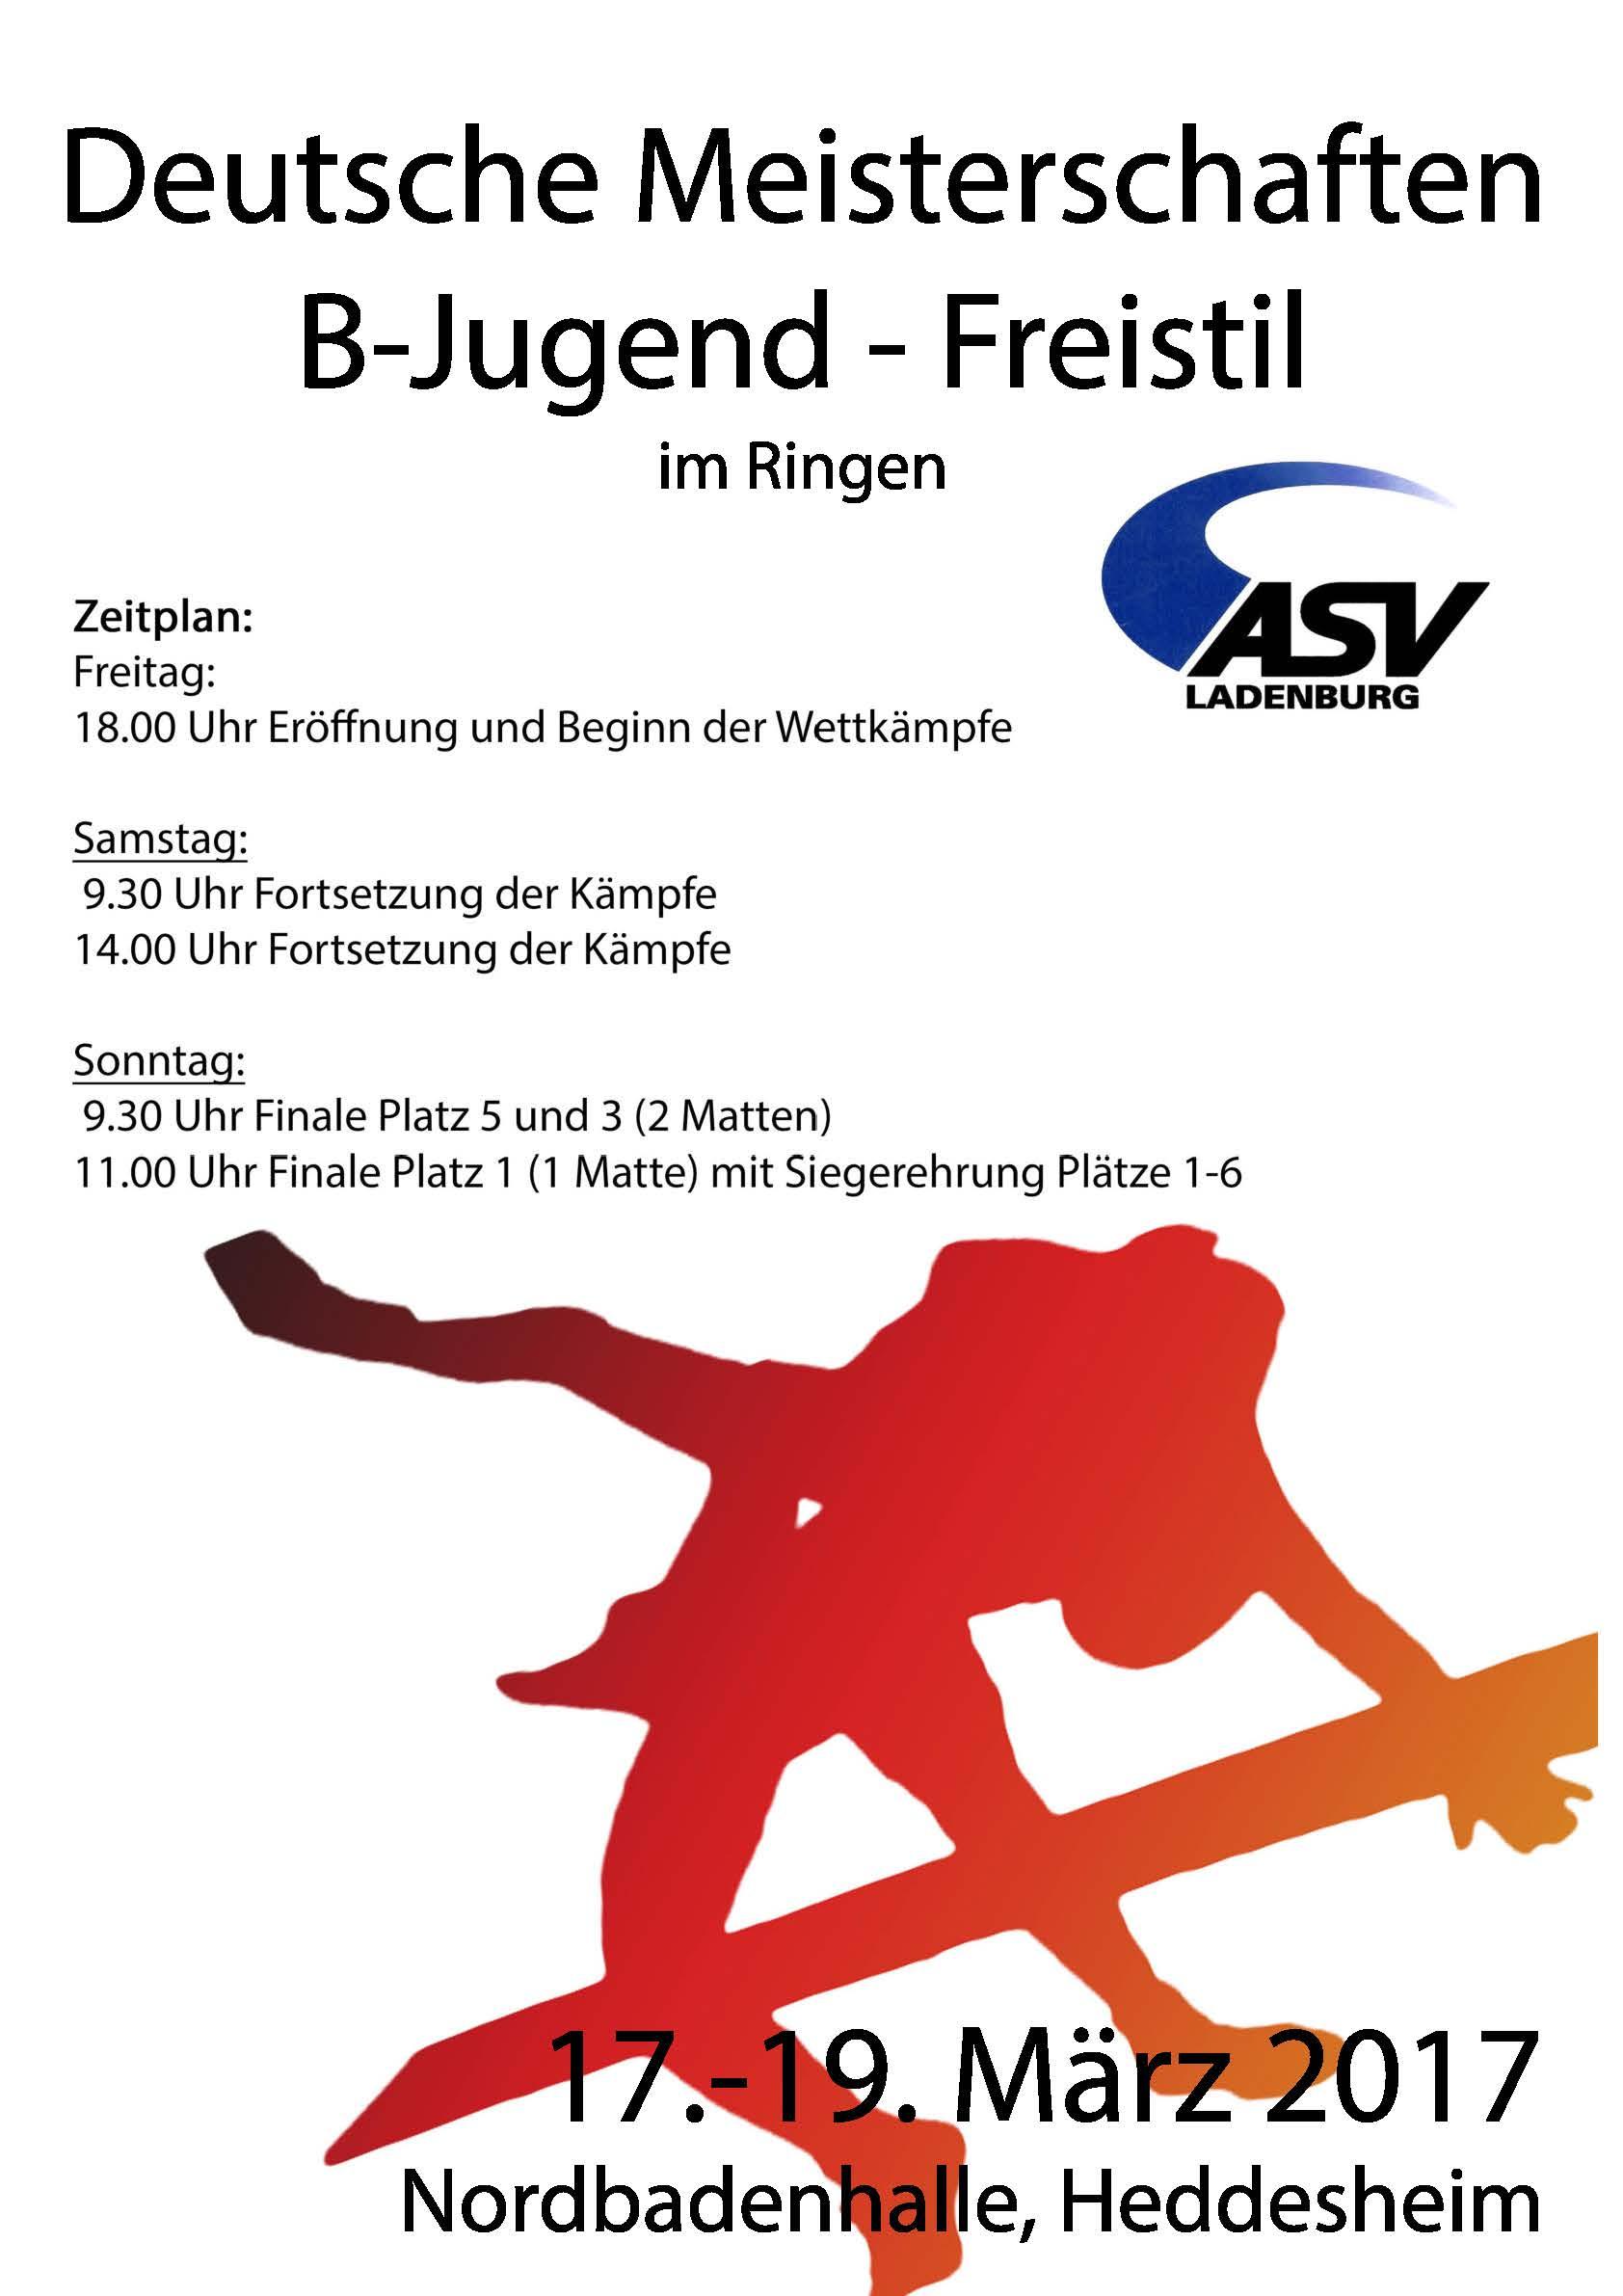 DM B-Jugend FS 2017